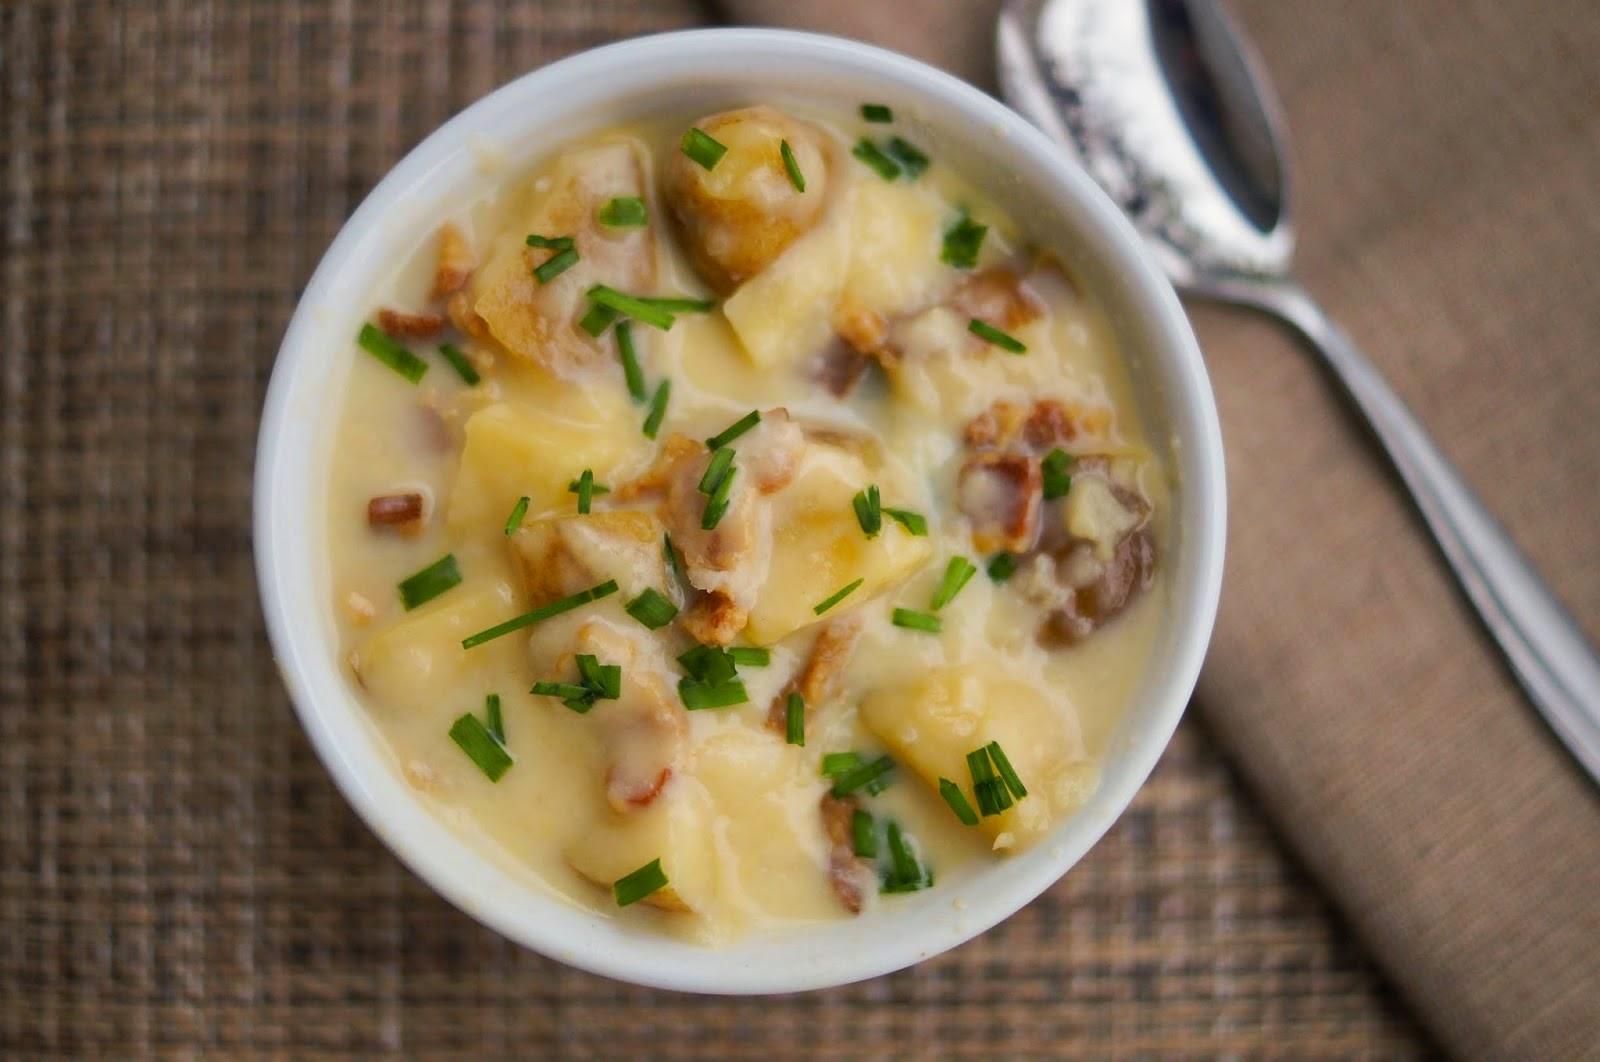 chilis loaded baked potato souprecipe